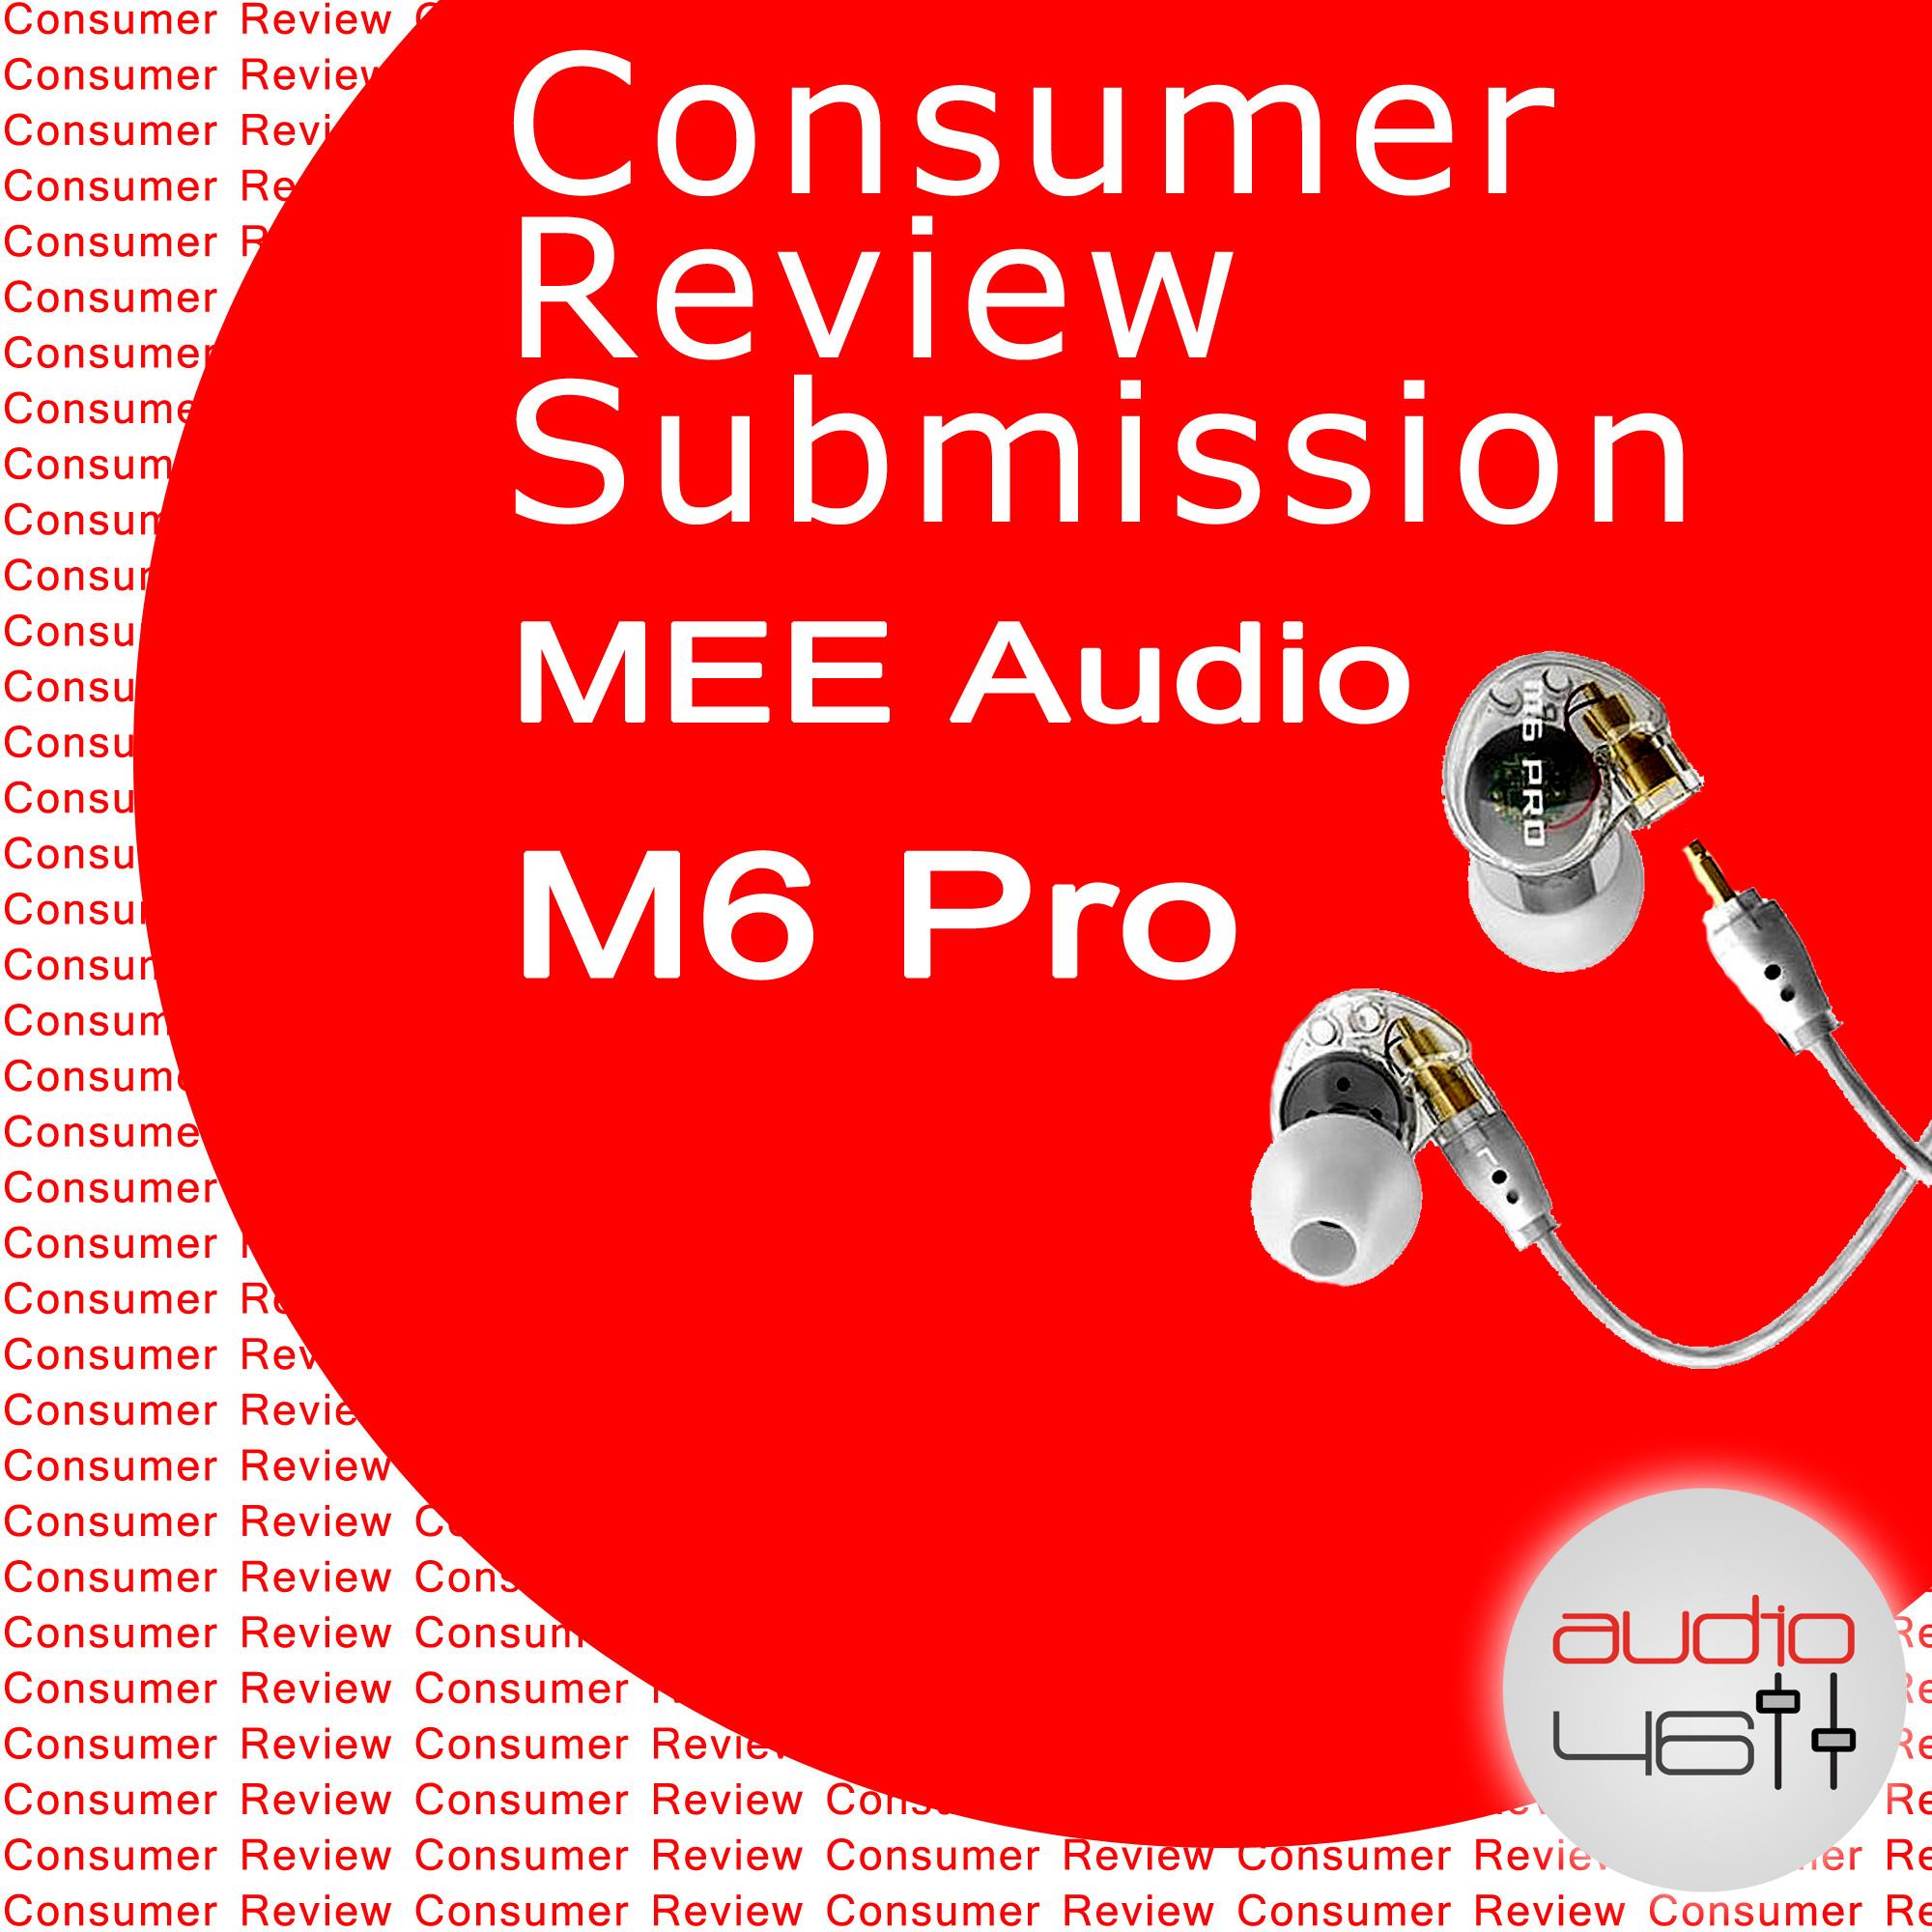 Consumer Review Mee Audio M6 Pro